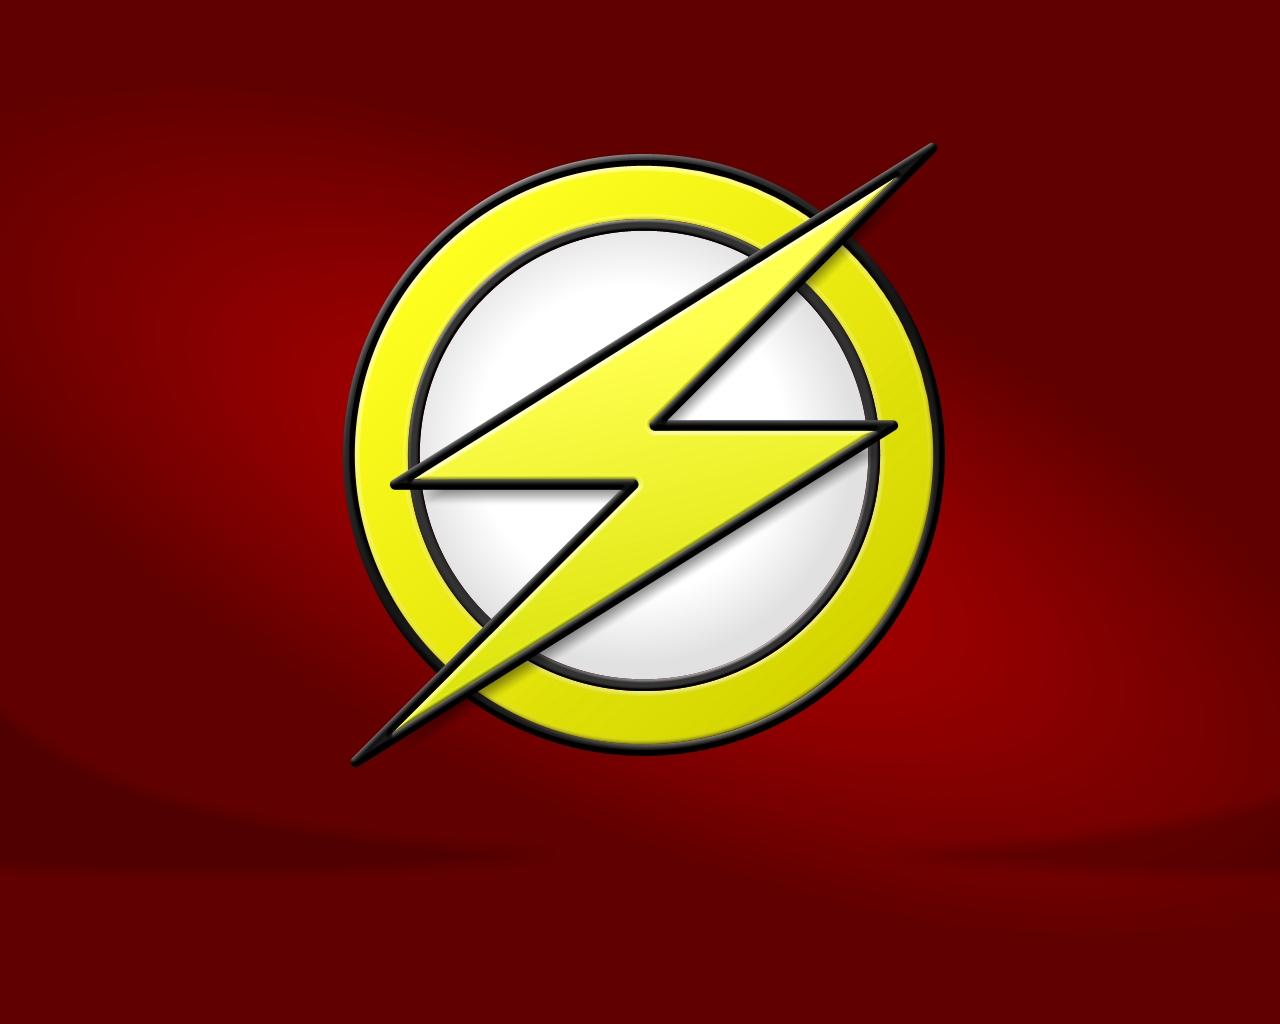 Valois blog the flash logo 1280x1024